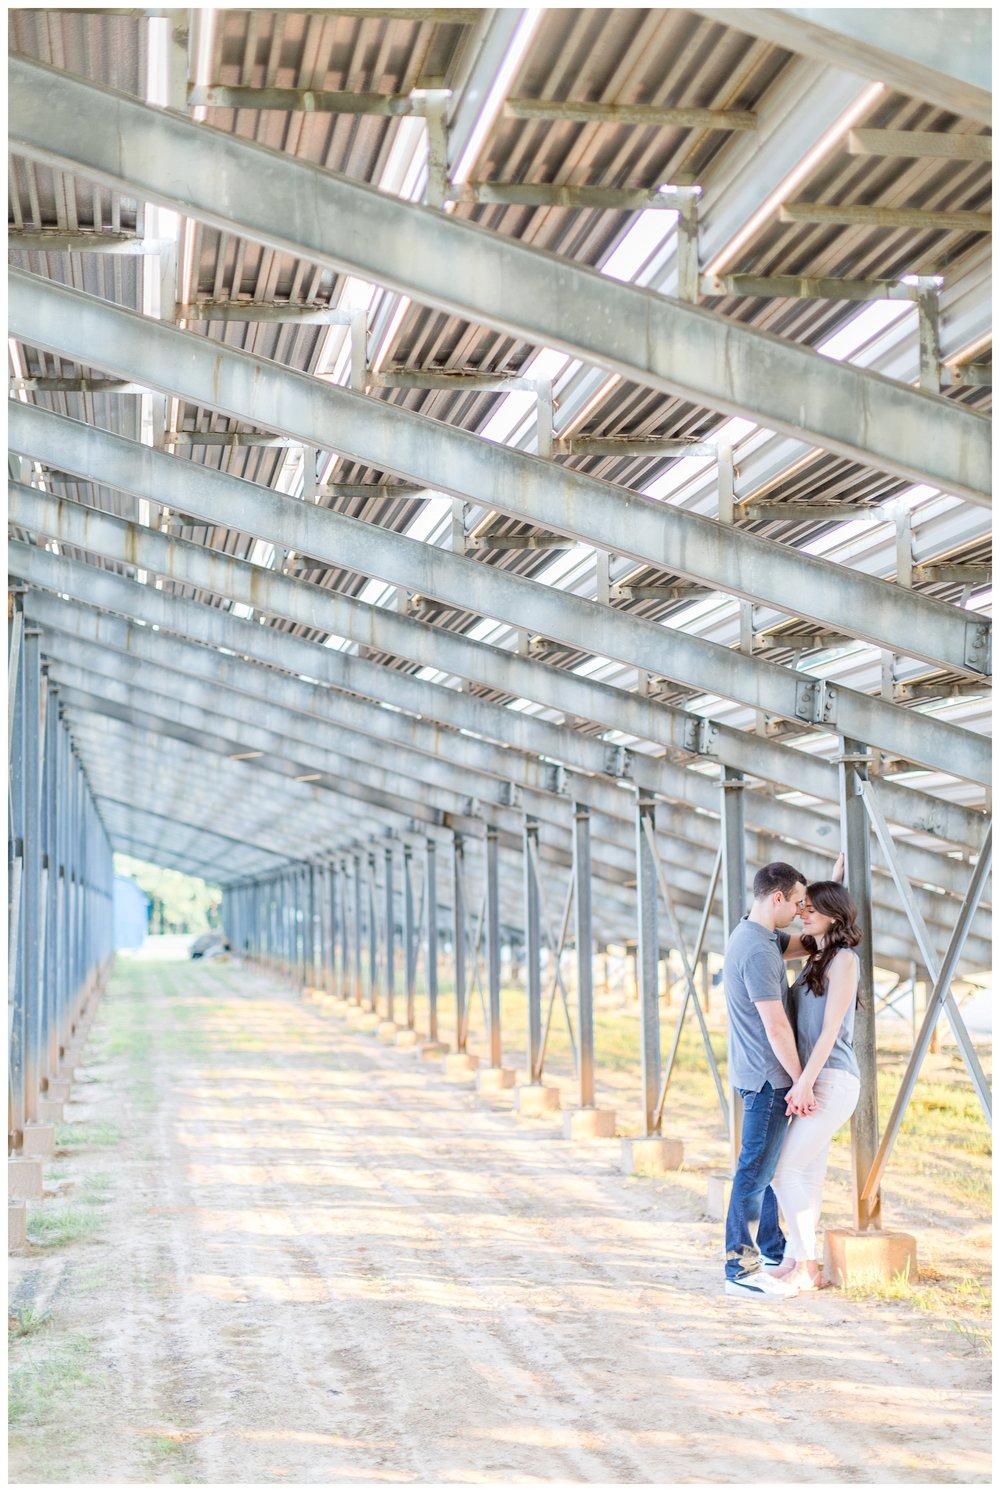 Meadowlark Botanical Garden Engagement | Virginia Wedding Photographer Kir Tuben_0051.jpg